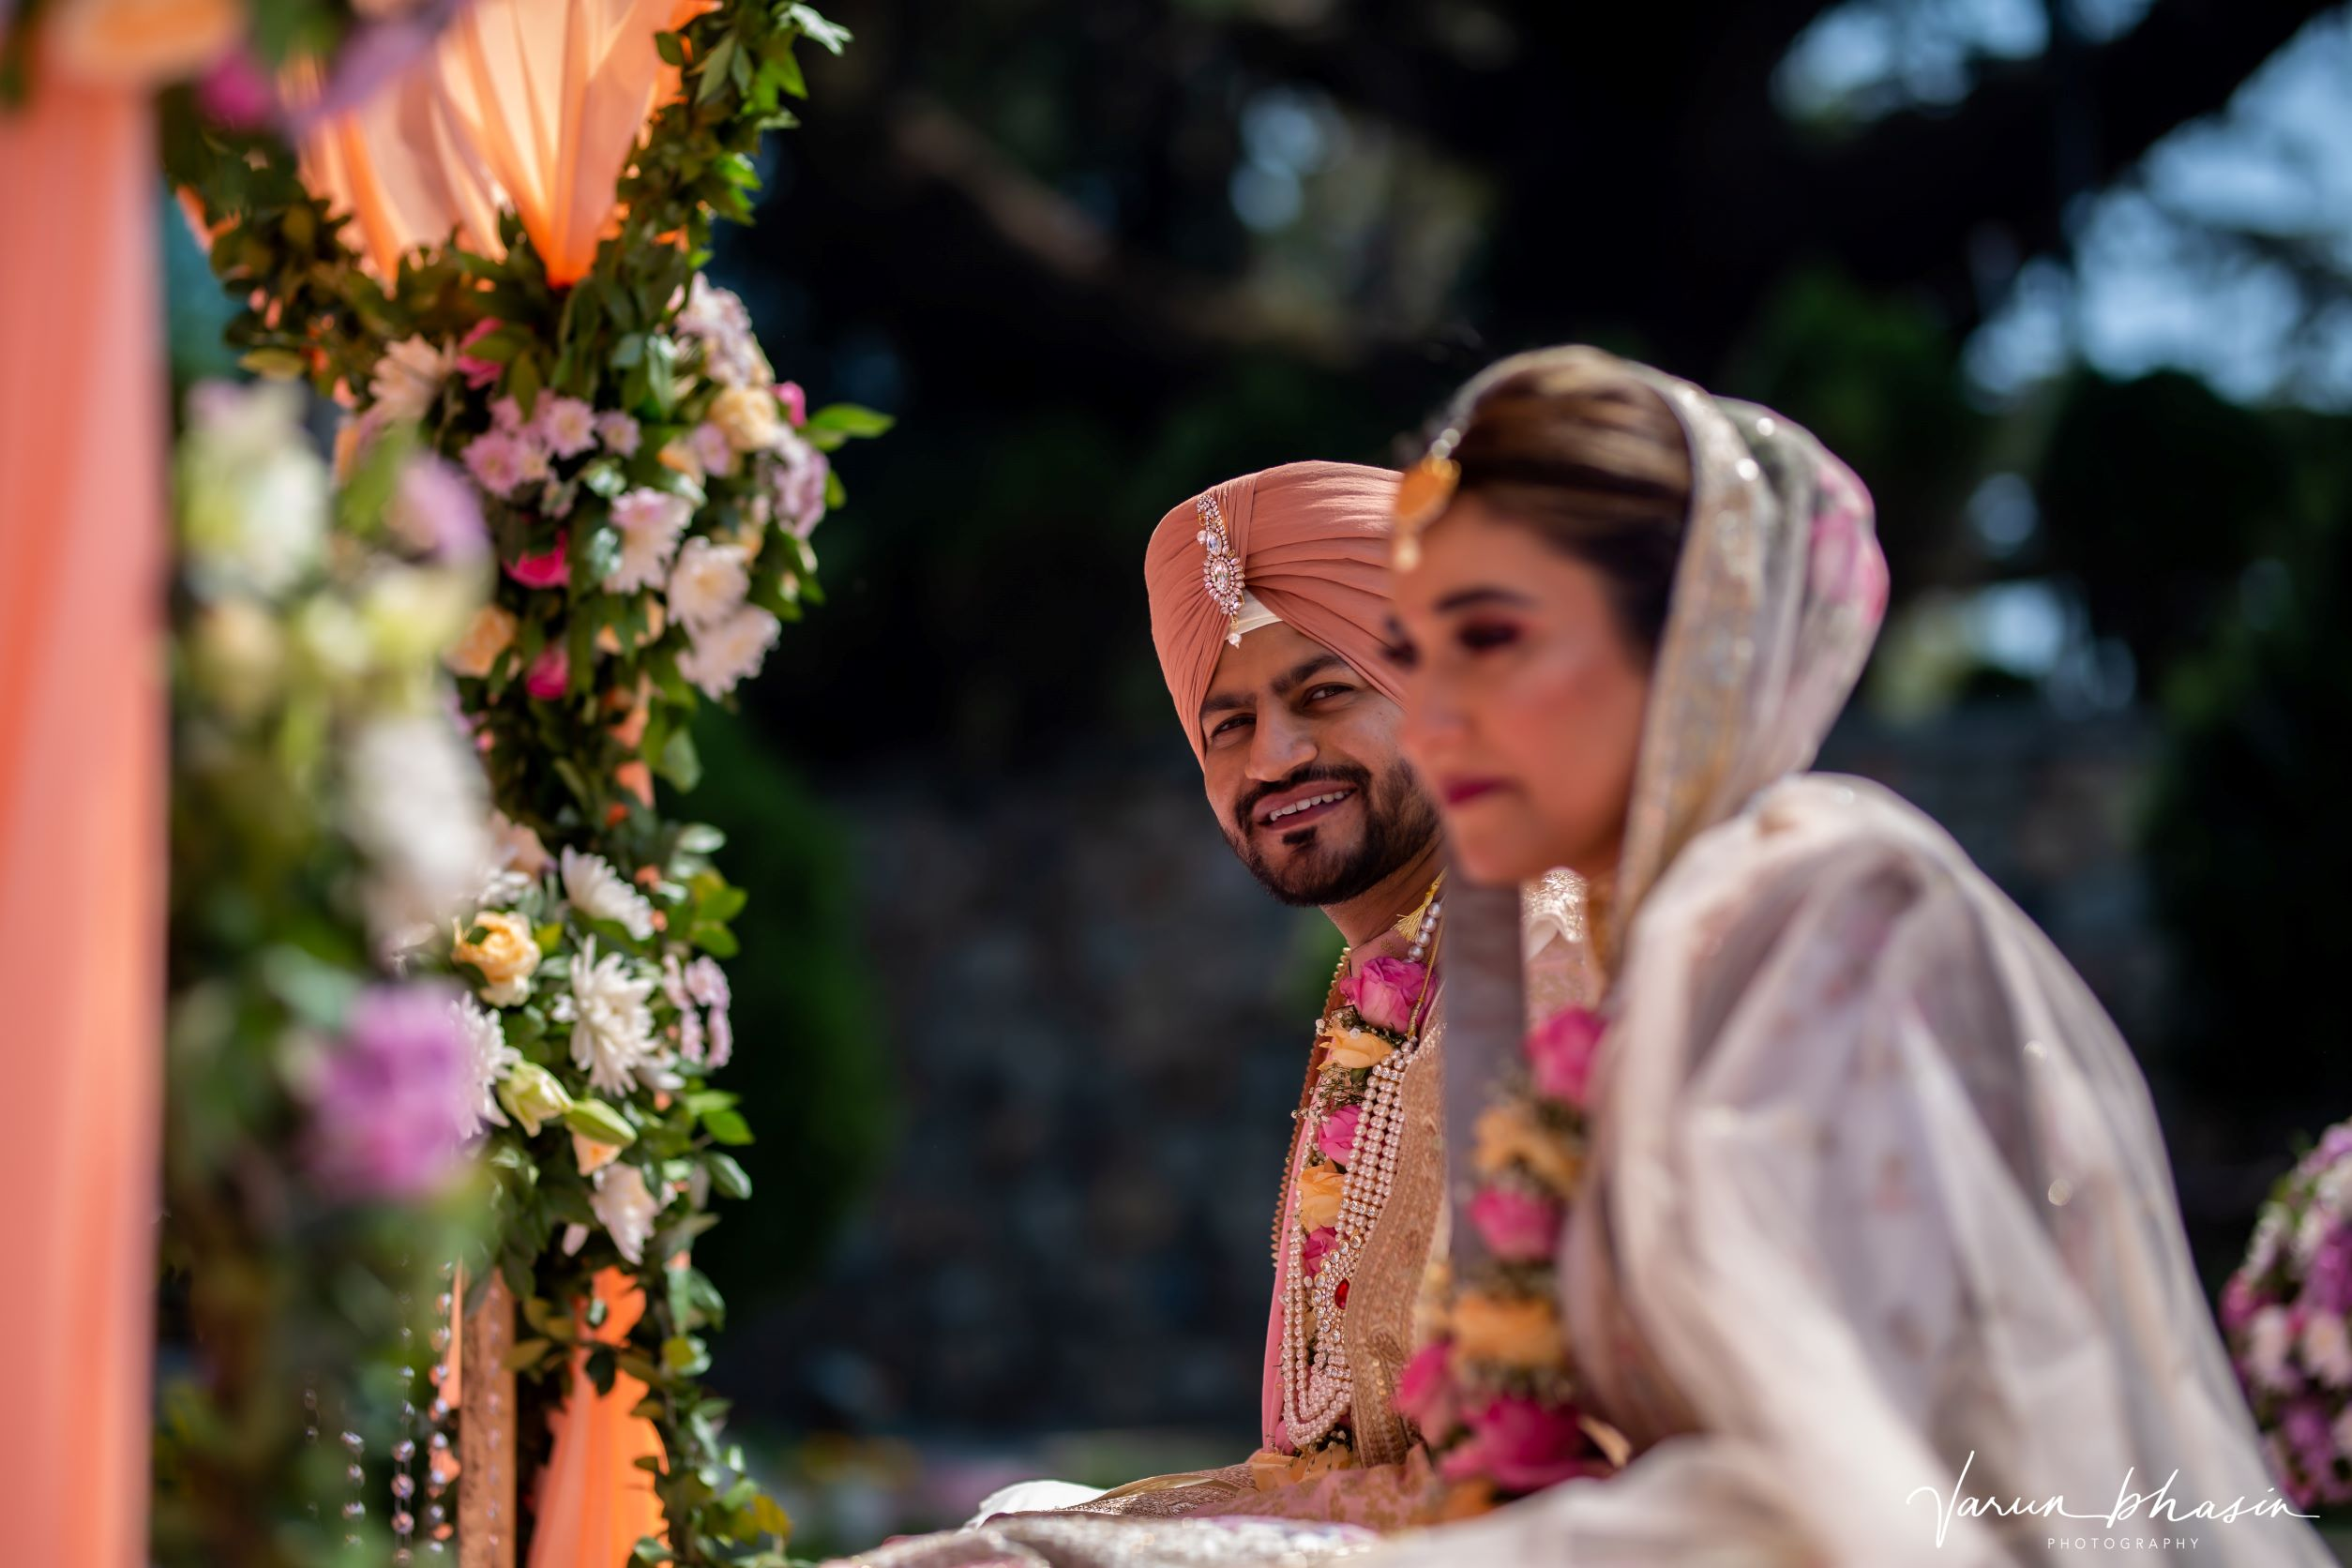 candid shot of the punjabi groom